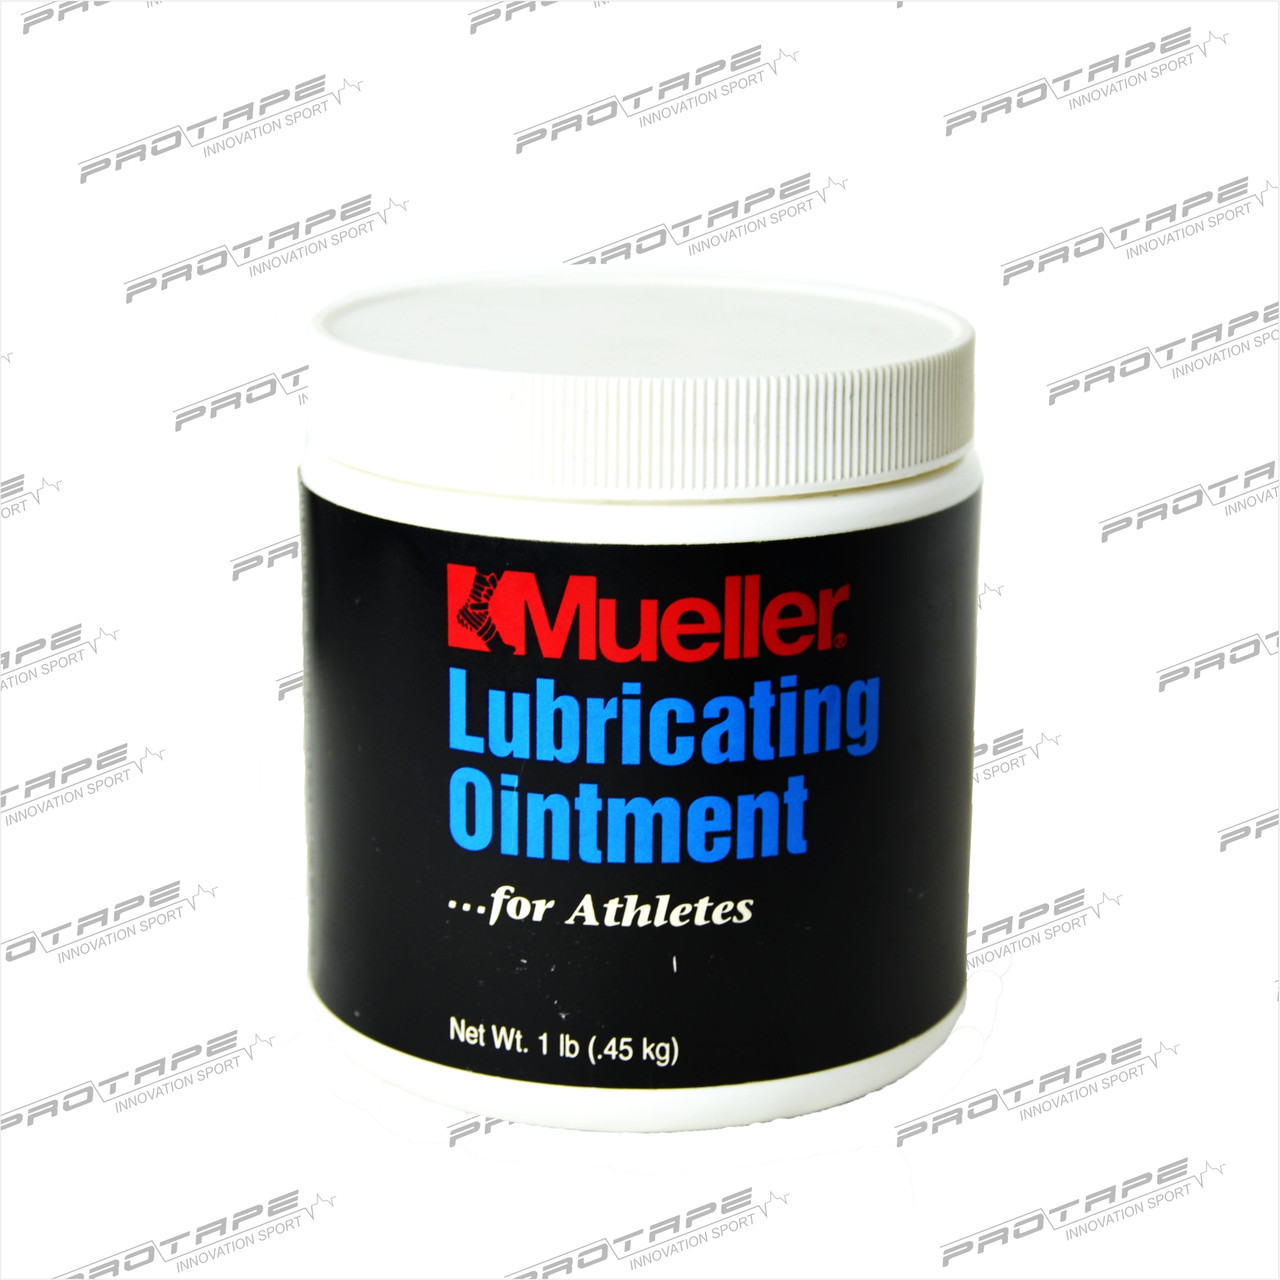 Mueller Lubricating Ointment Мазь, уменьшающая трение 453 гр